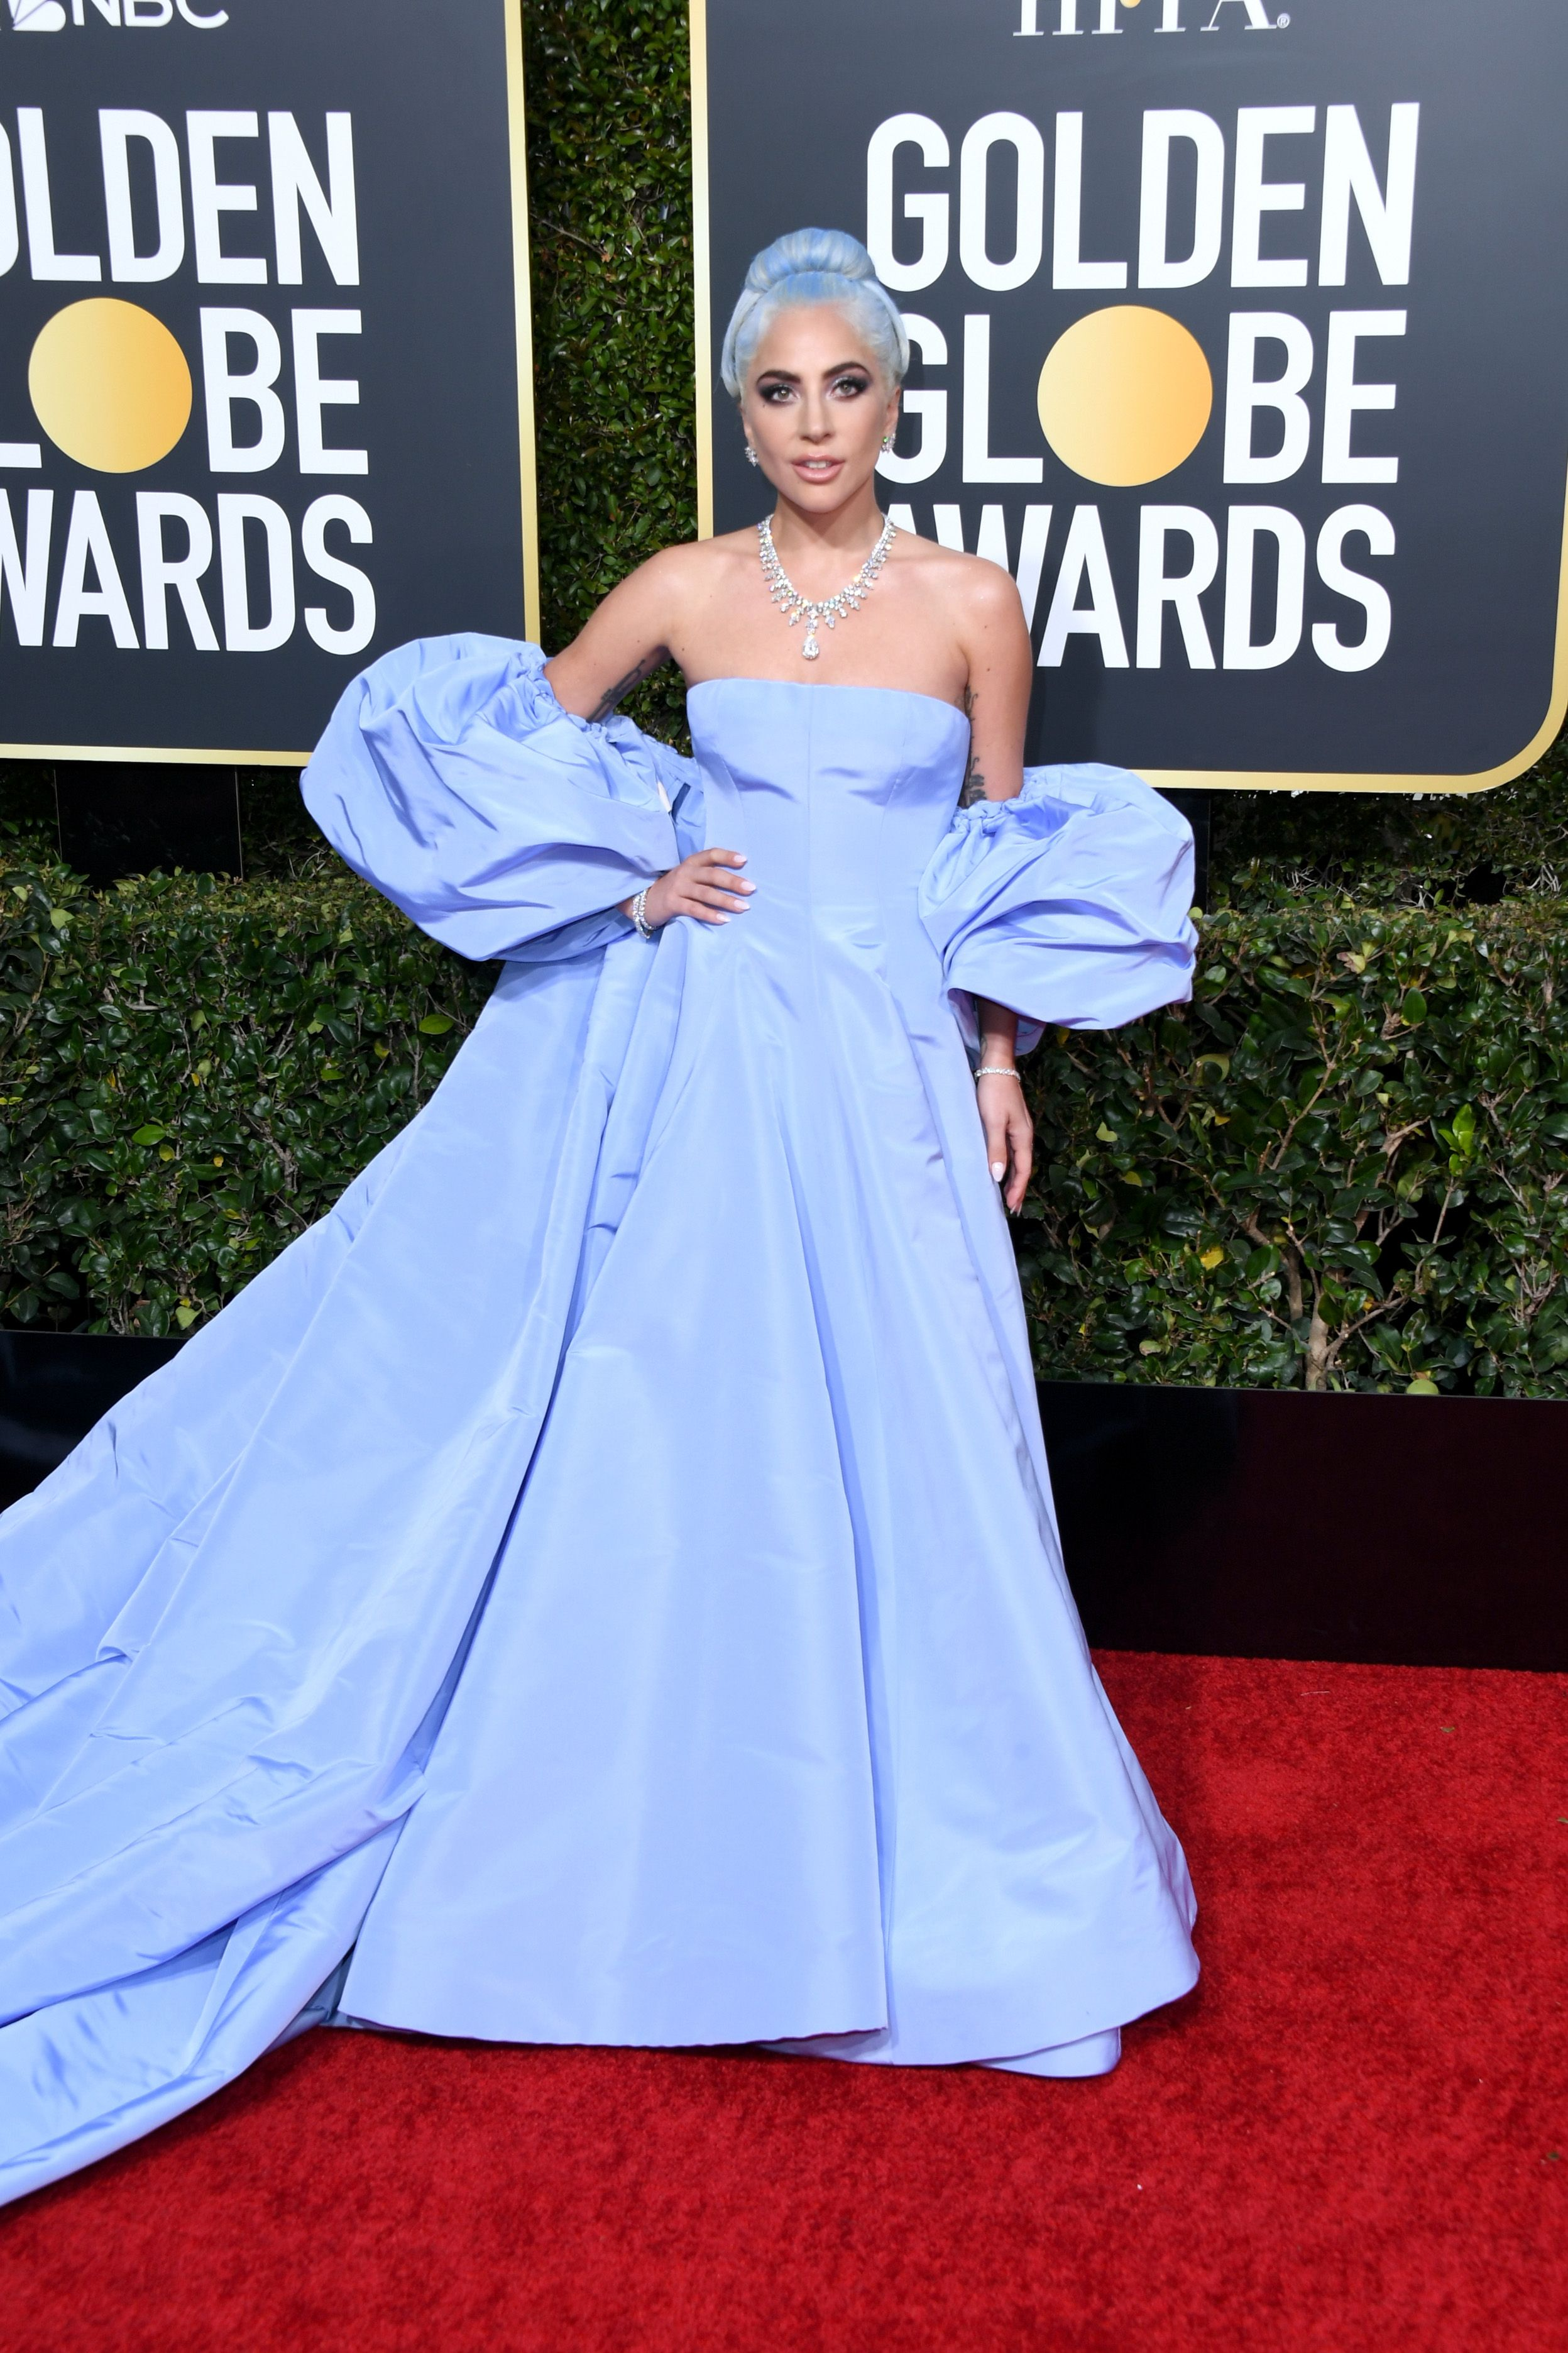 All the Red Carpet Dresses from Golden Globe Awards 2019